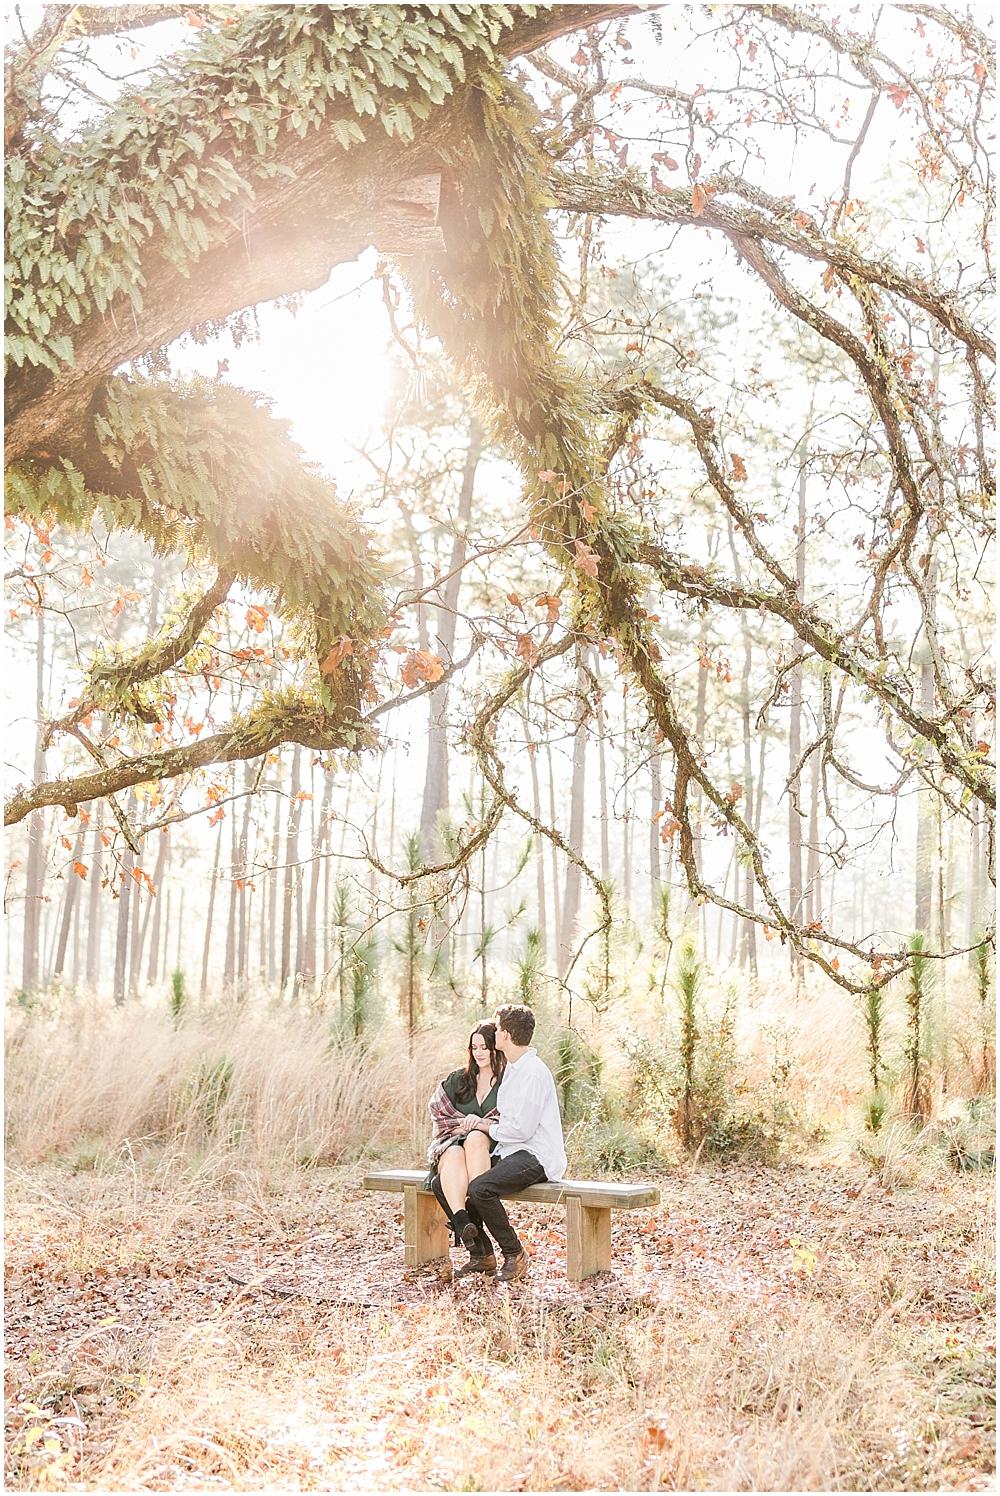 Ashton-Clark-Photography-Wedding-Portrait-Family-Photographer-Mobile-Alabama_0441.jpg